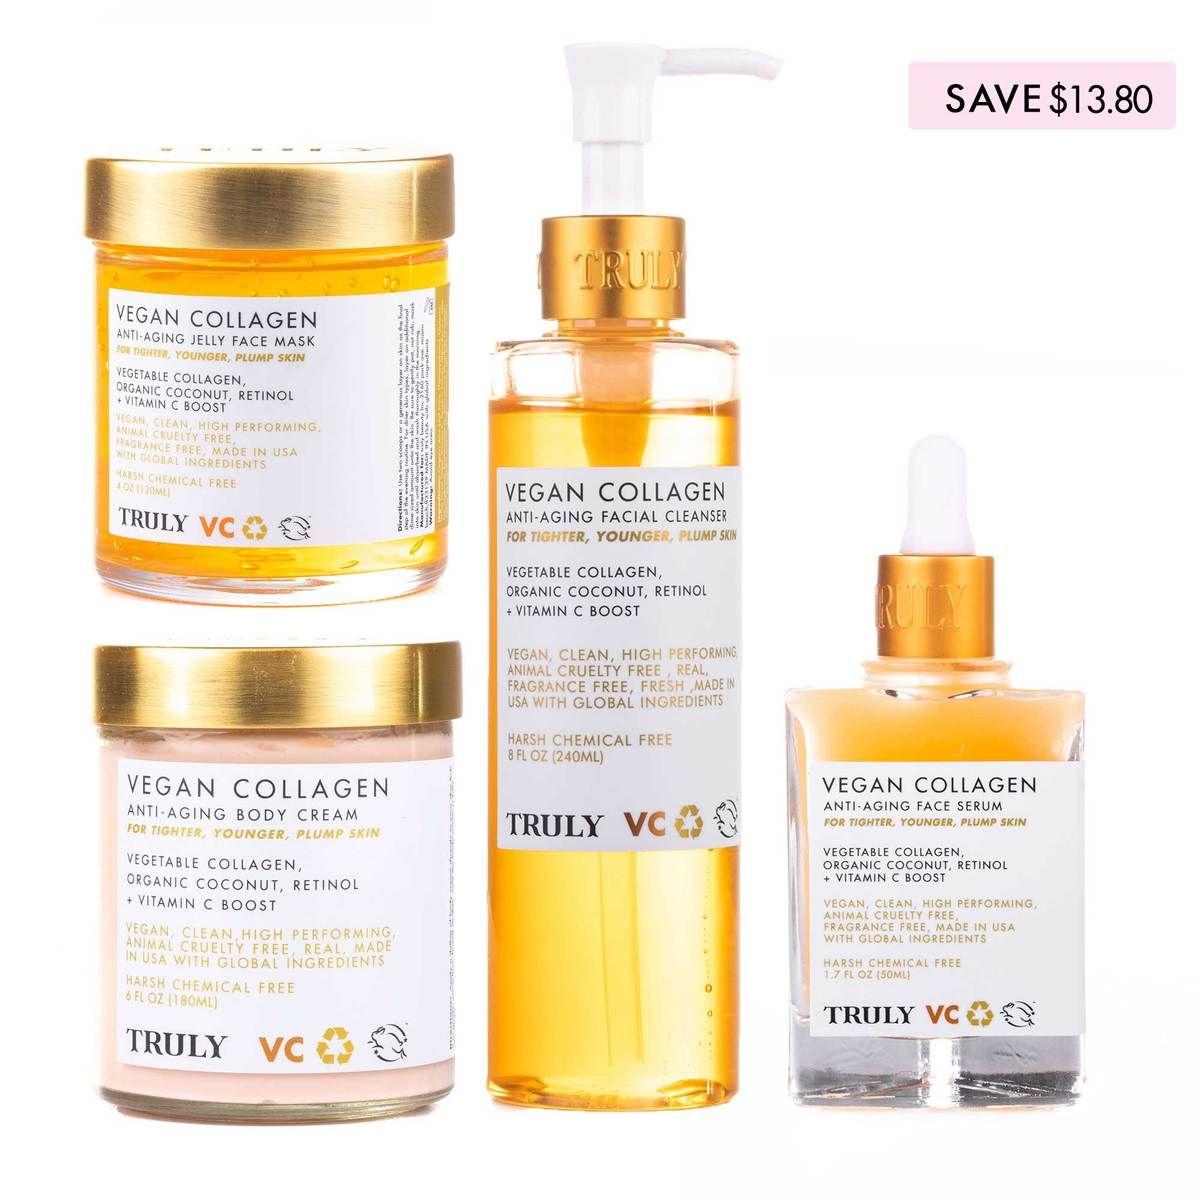 Vegan Collagen Bundle In 2020 Anti Aging Facial Cleanser Anti Aging Body Cream Collagen Facial